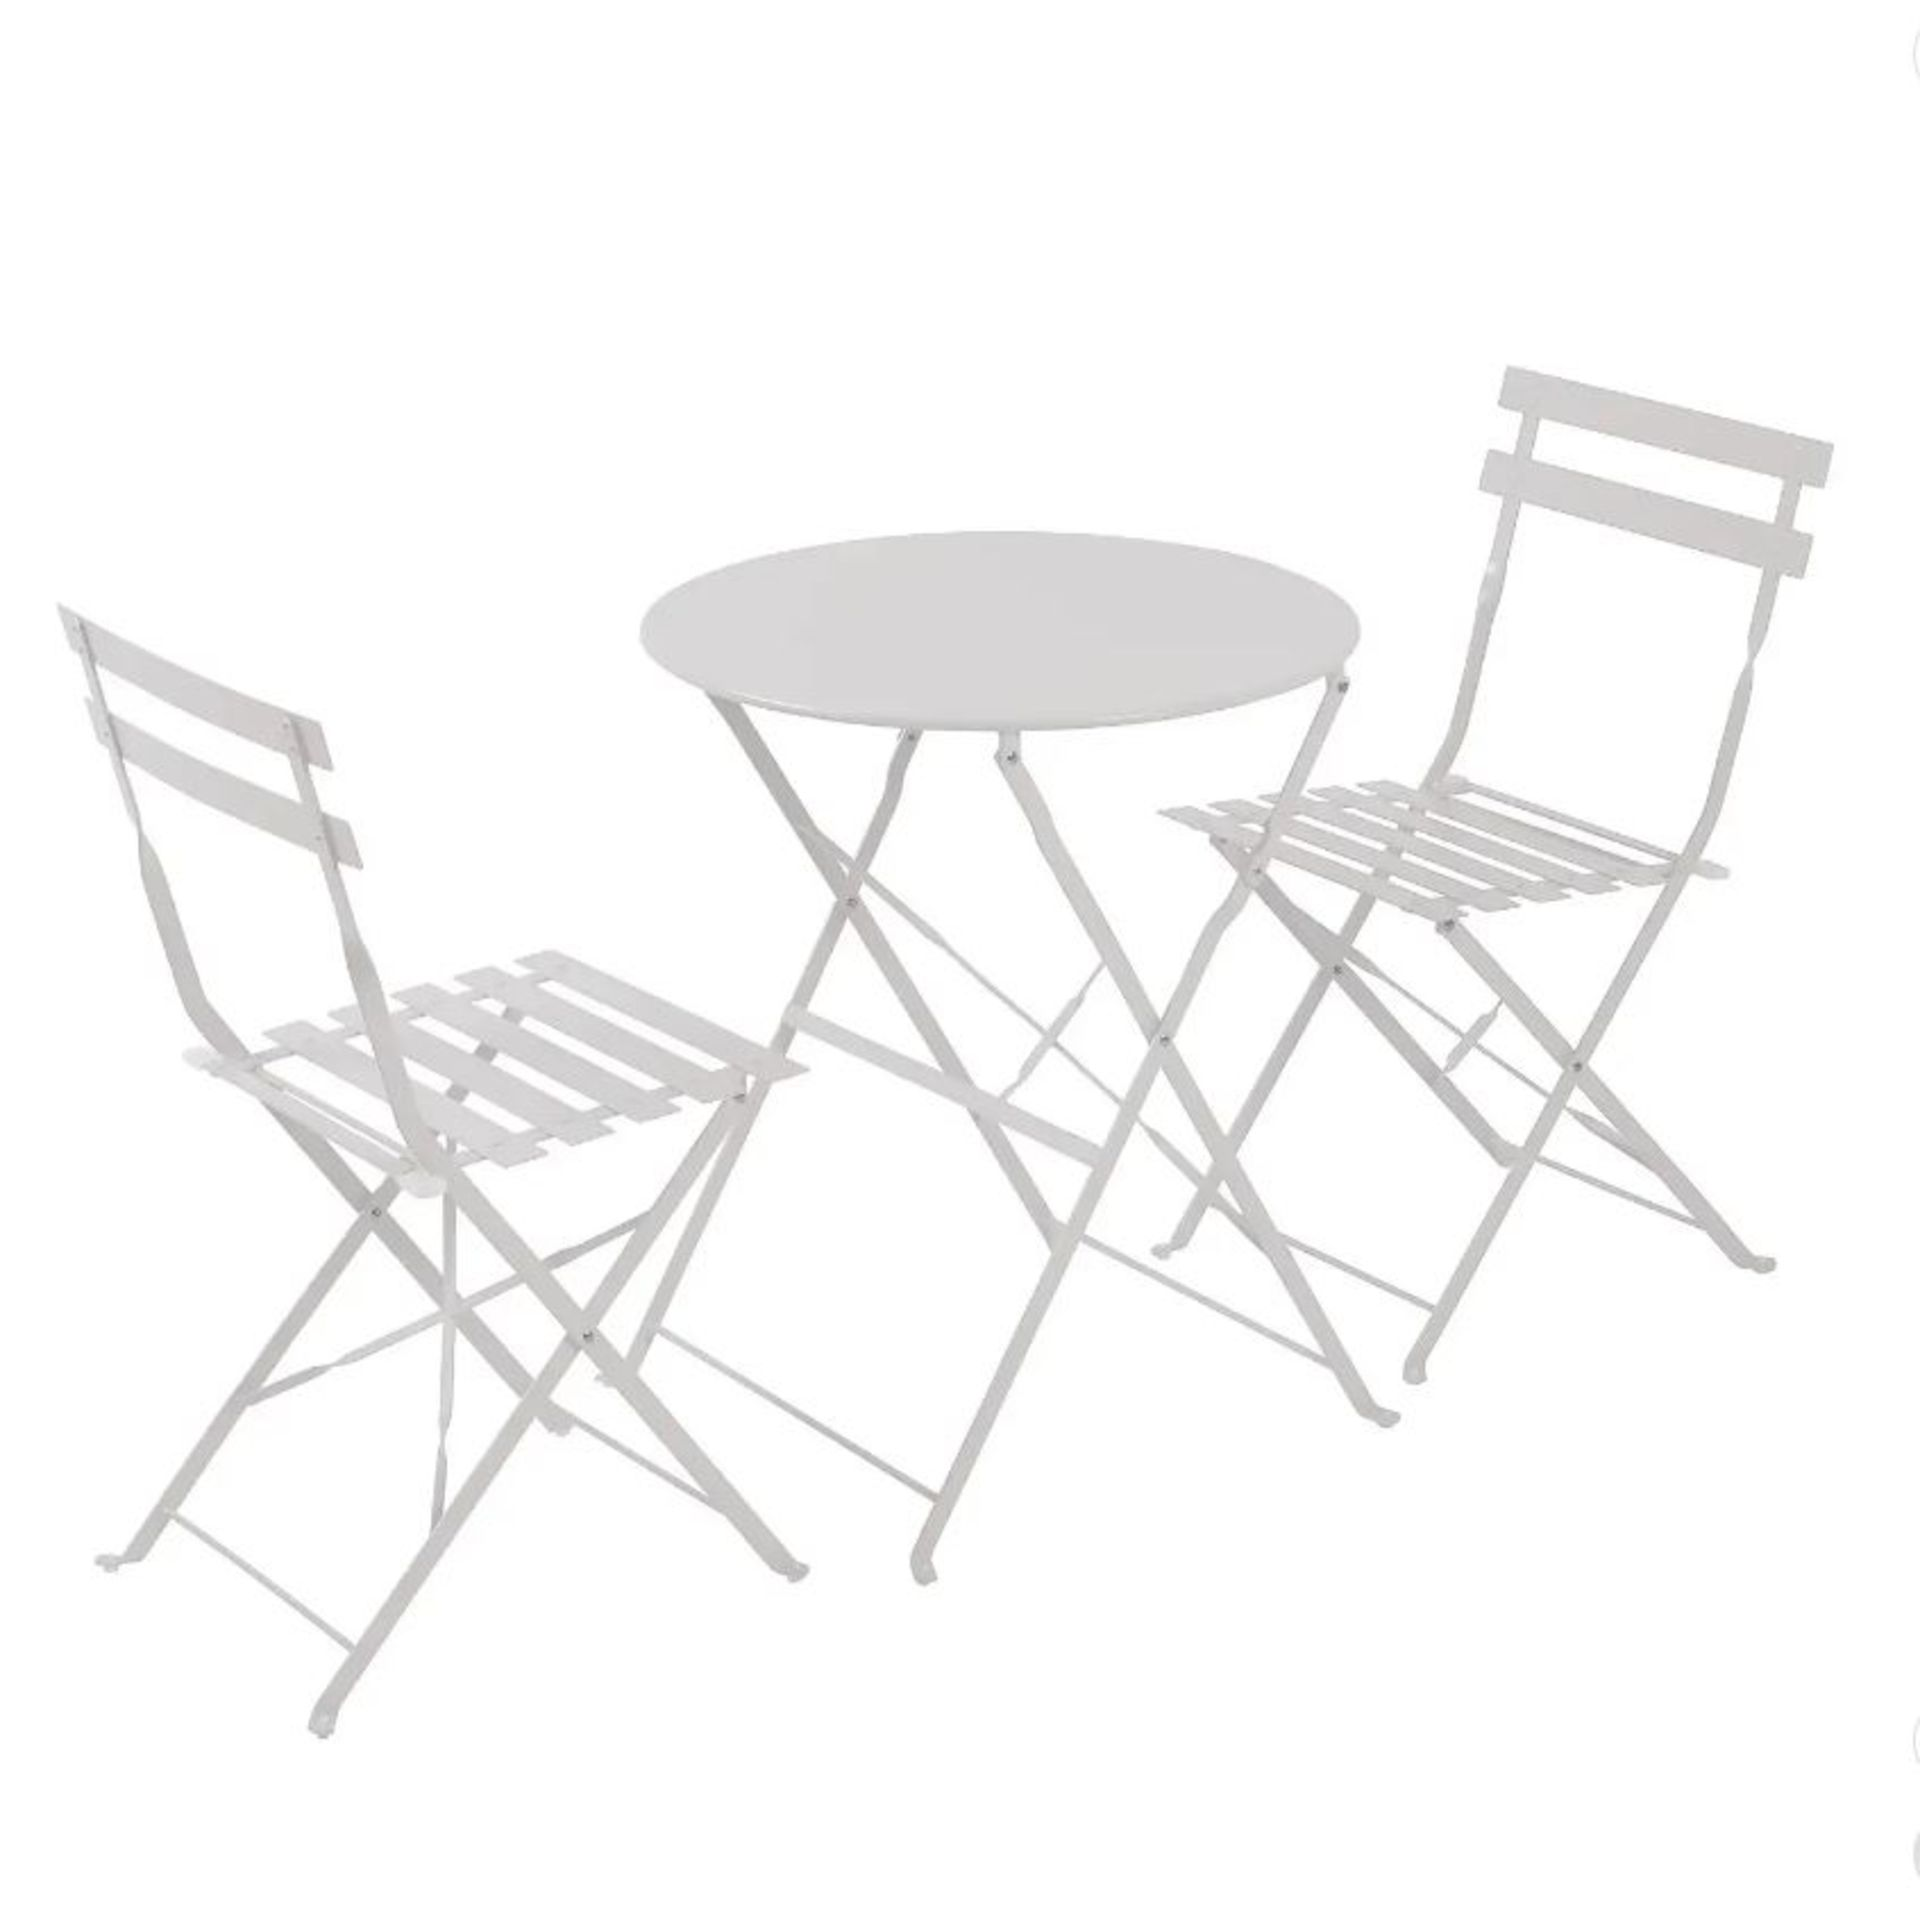 (P3) 1x Lazio Bistro Set Grey. Powder Coated Steel Frame. All Units Foldable For Easy Storage. (T